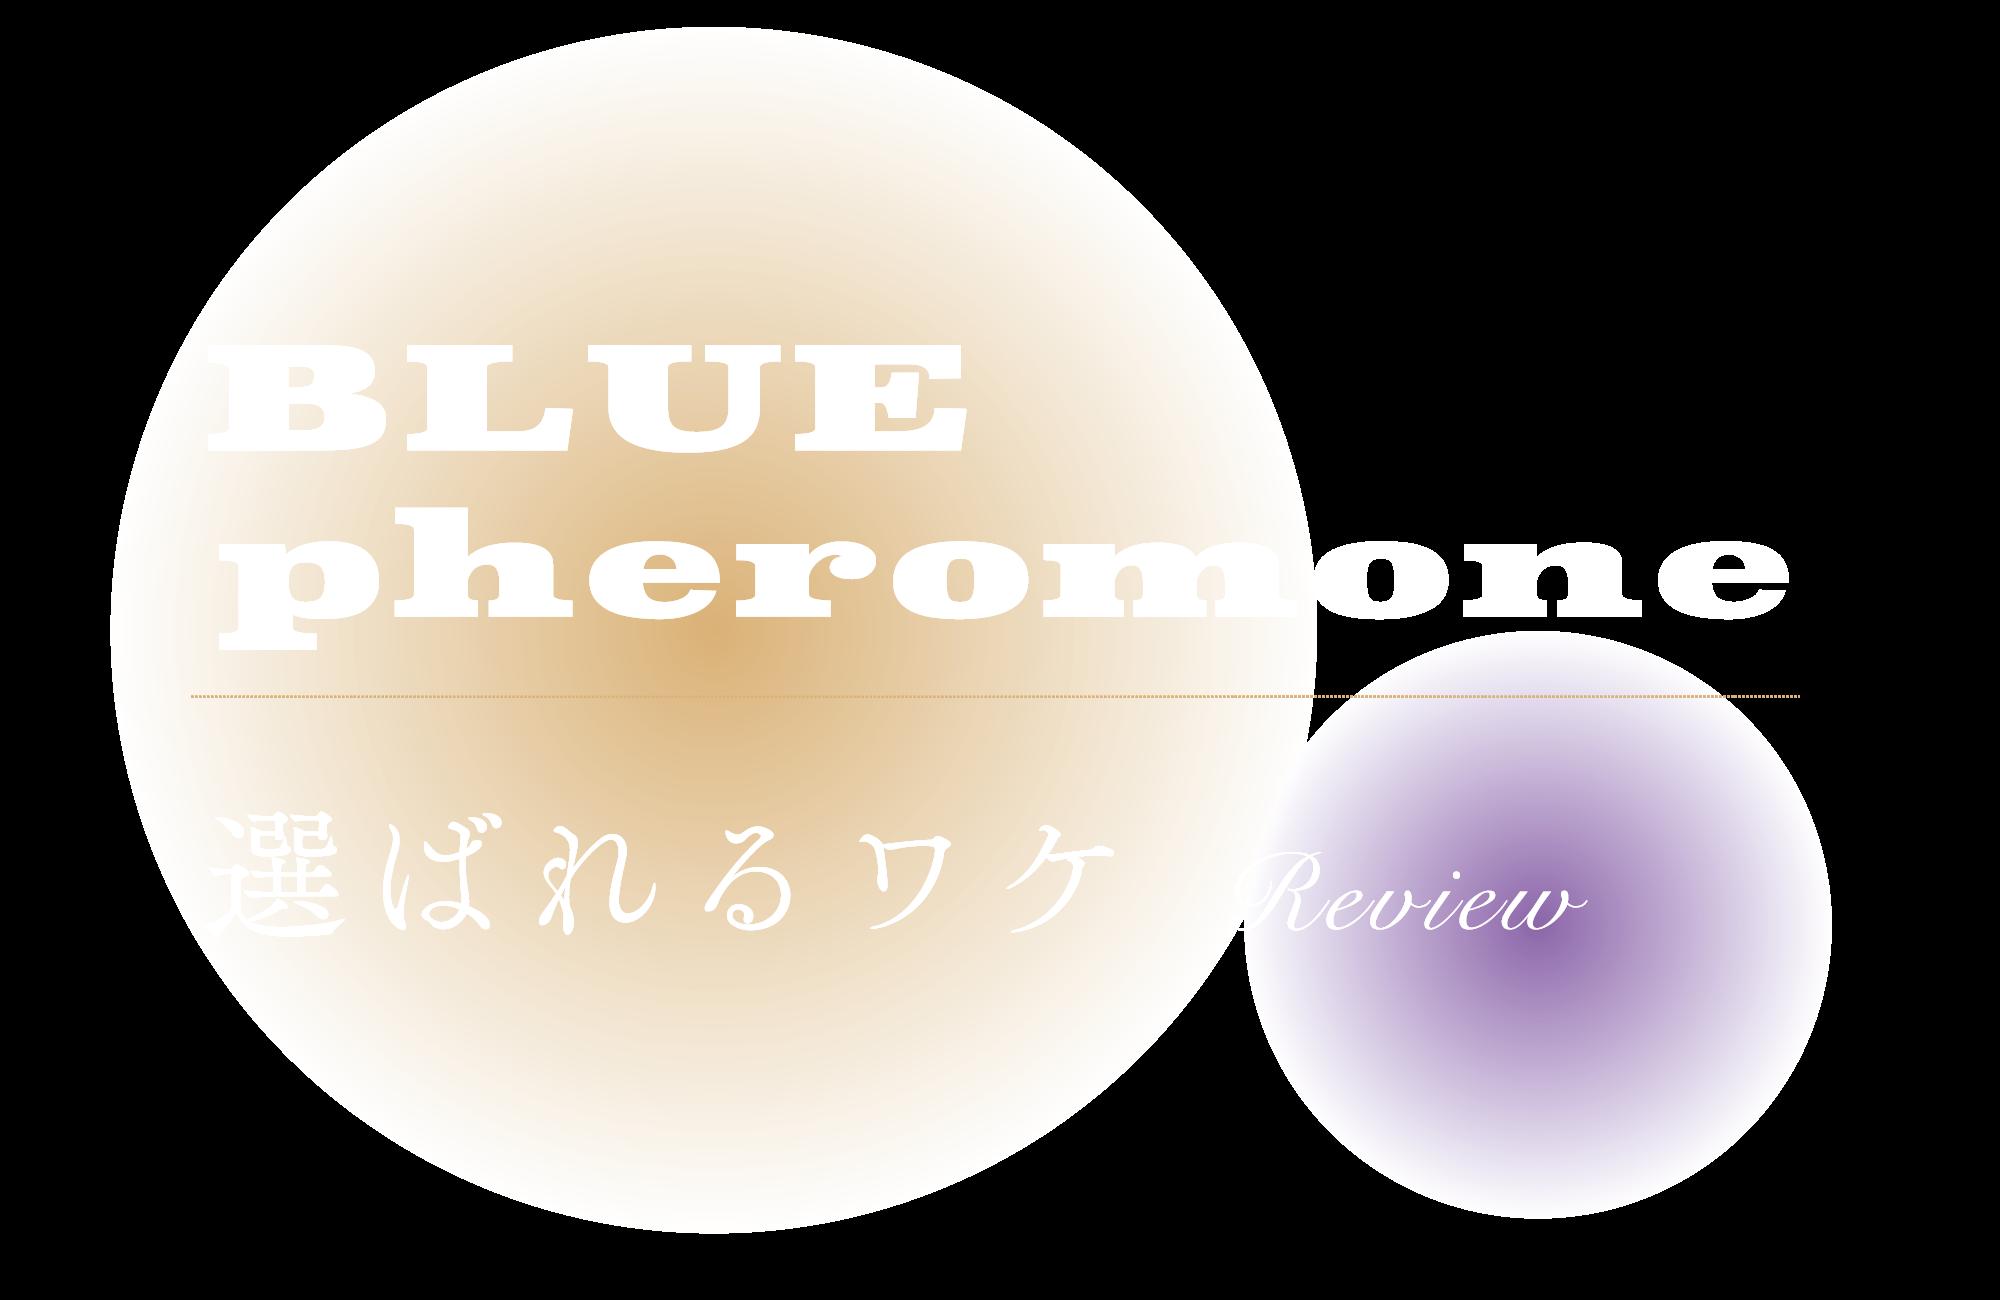 BLUE pheromone 選ばれるワケ review